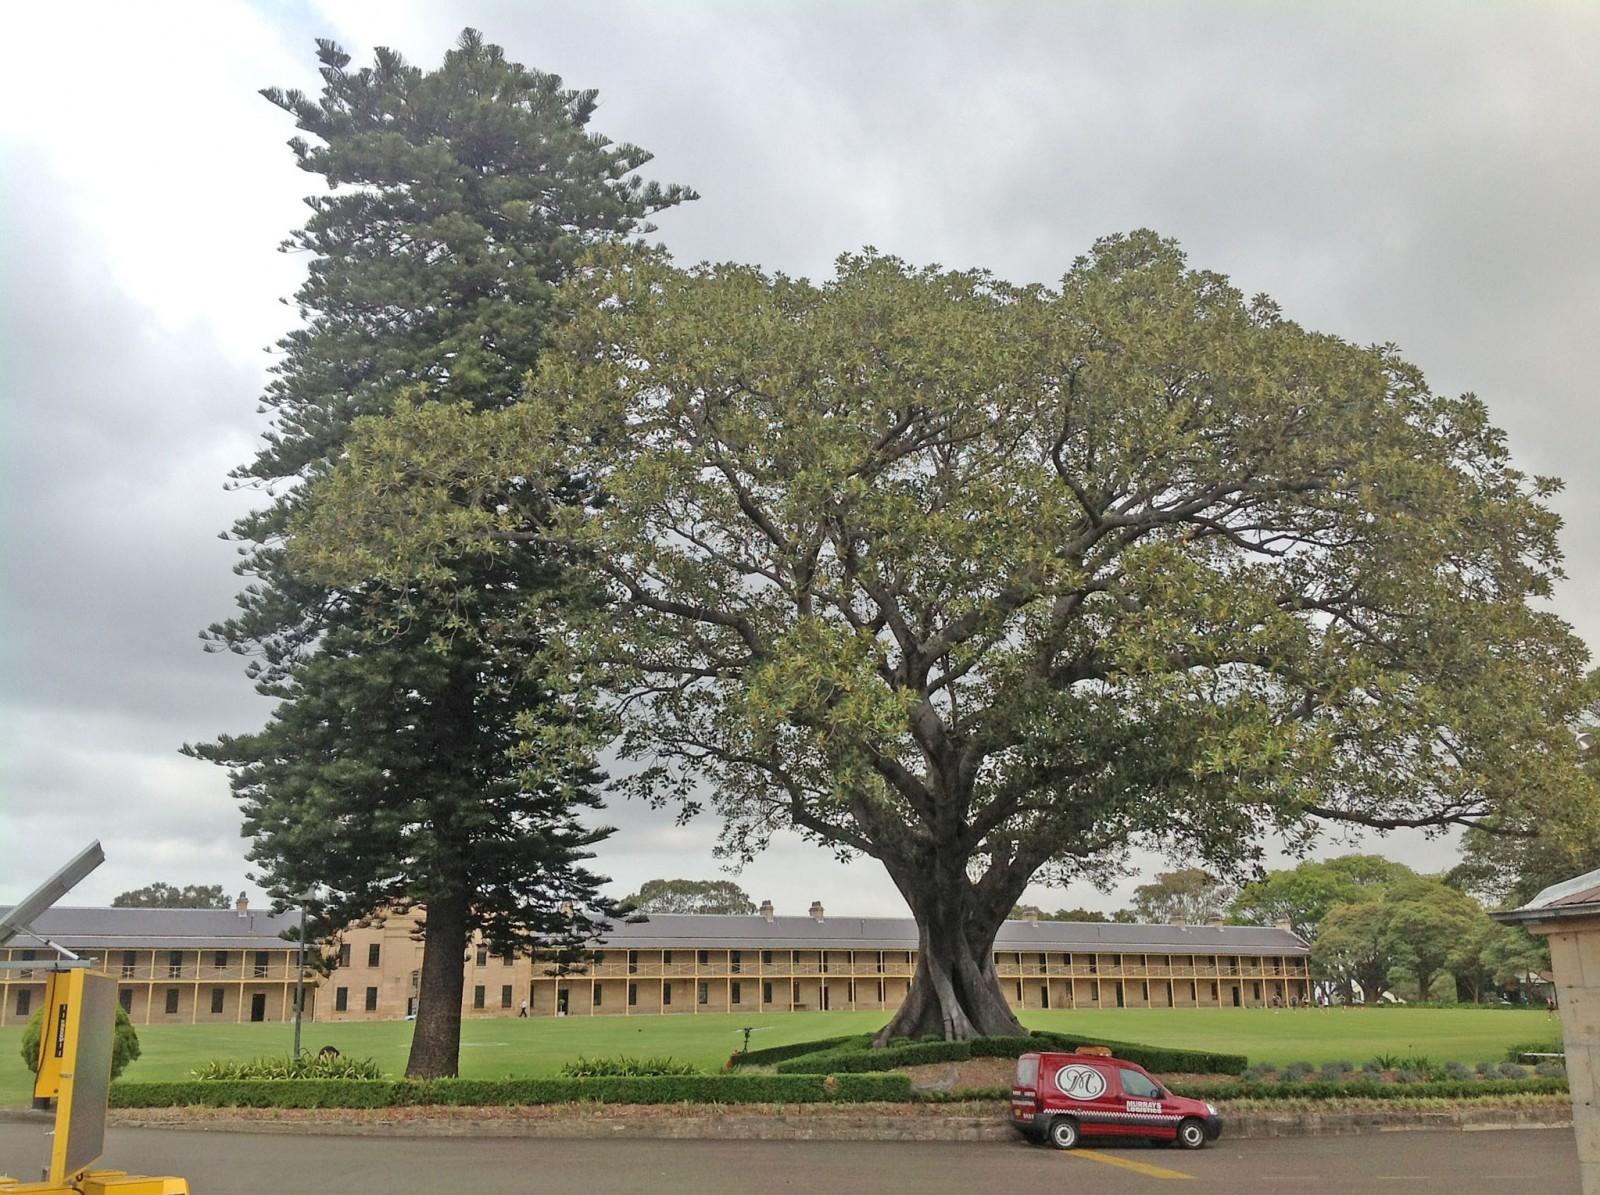 Moreton Bay Figs and Norfolk Island Pines